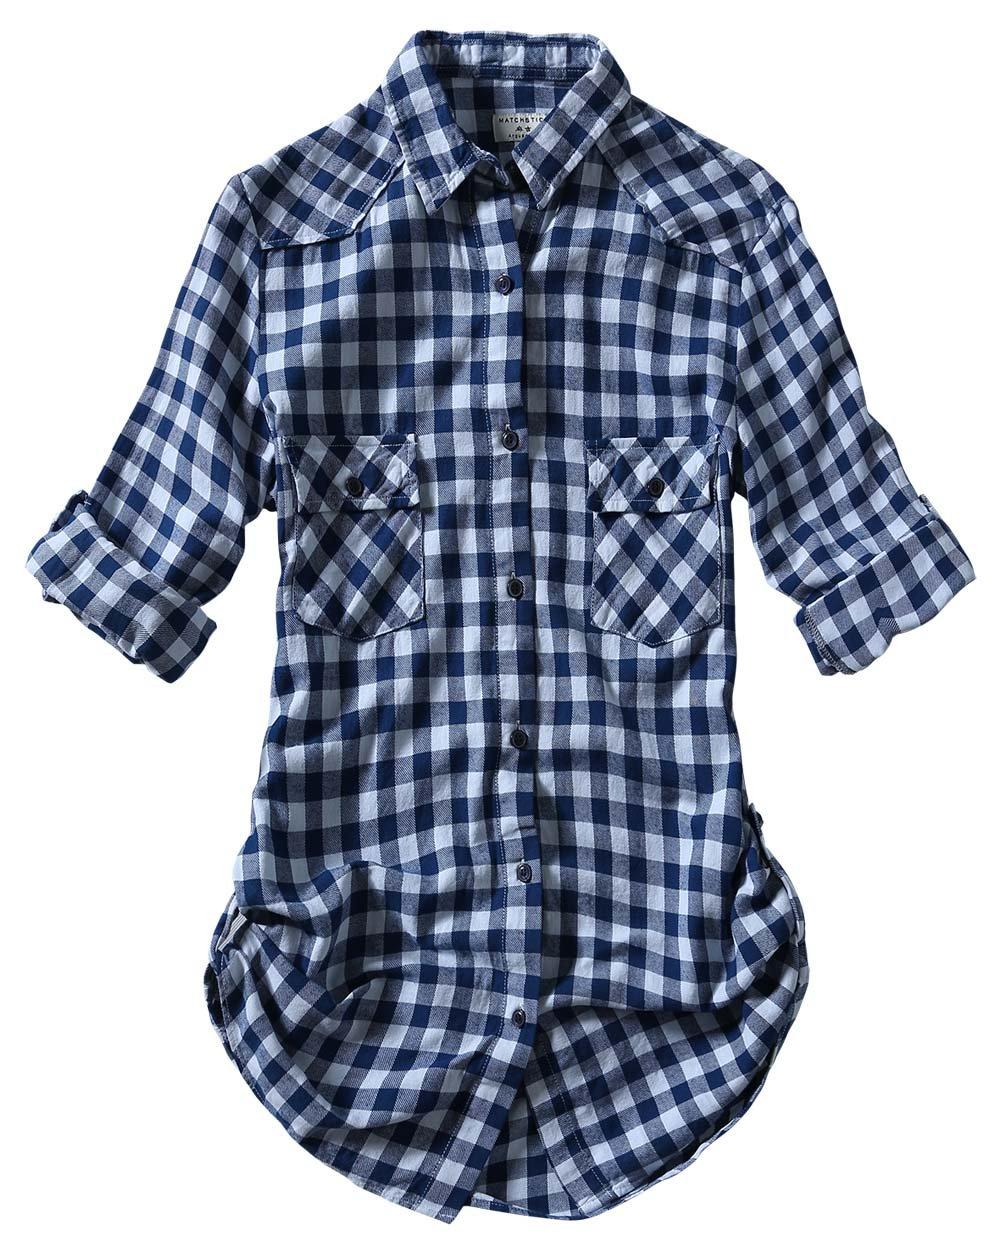 Match Women's Long Sleeve Cotton Plaid Shirt (Large, 2022 Check#7)